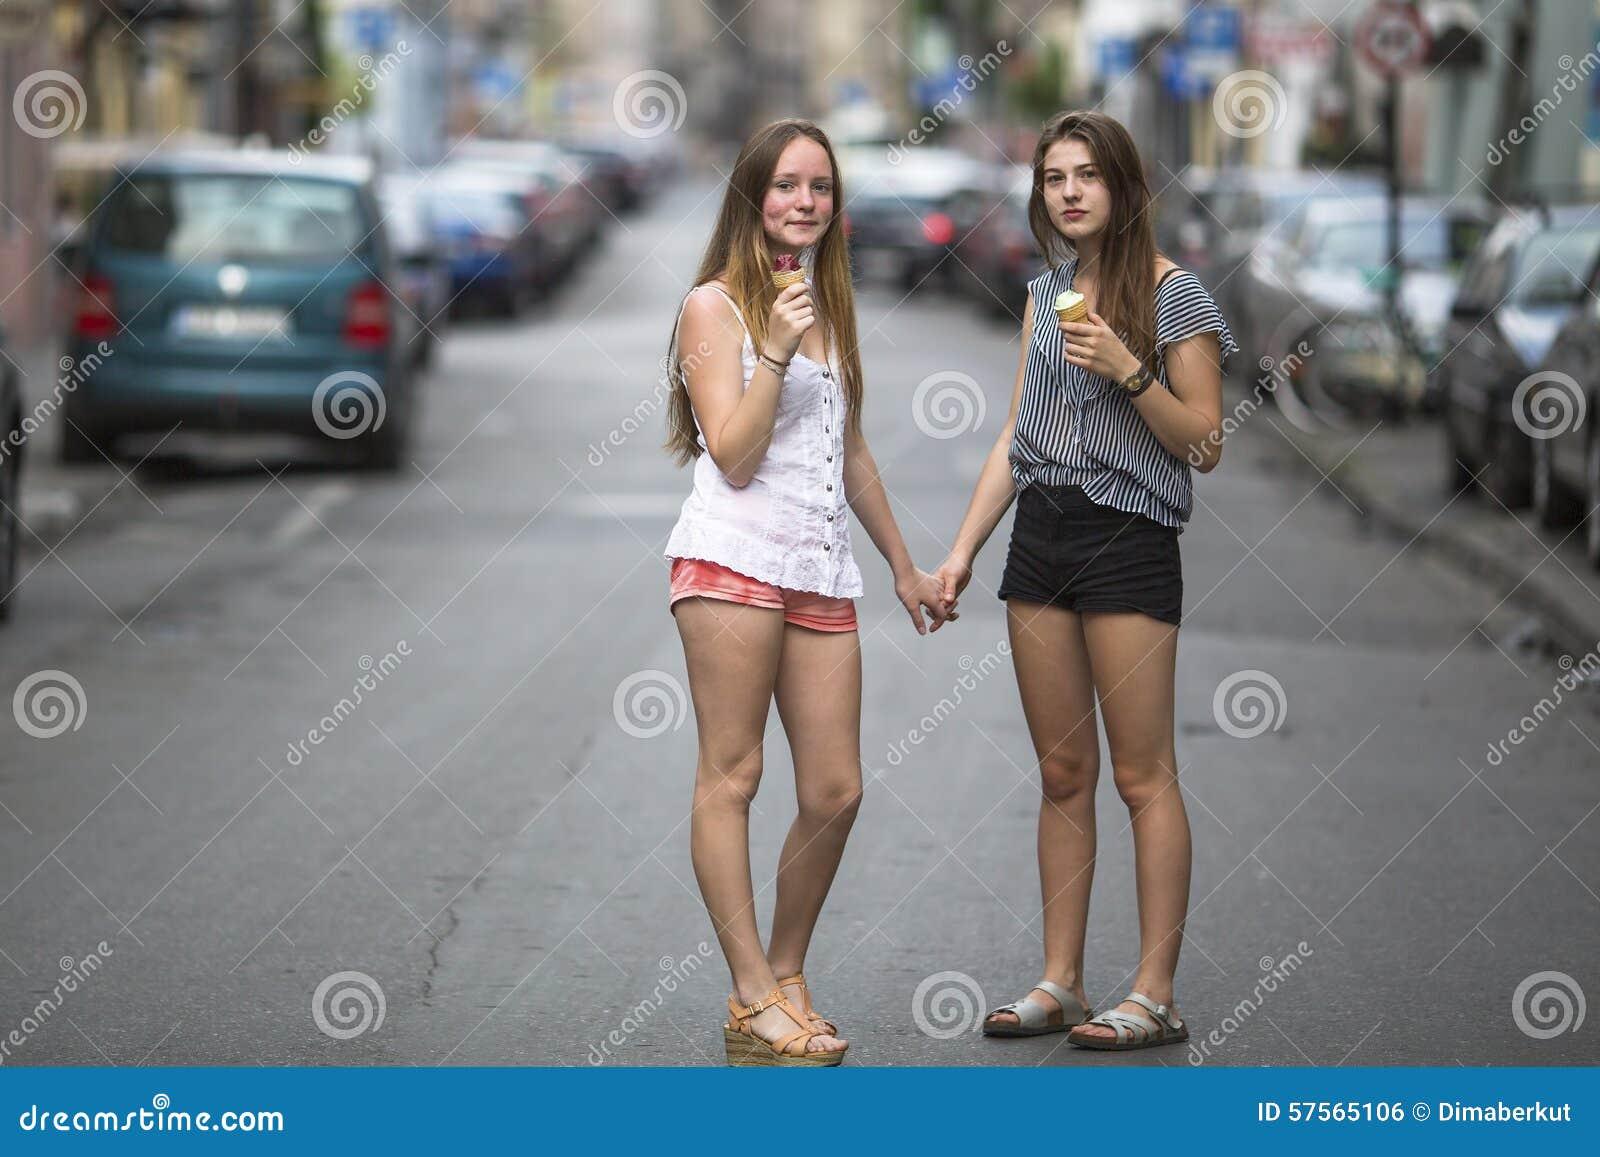 gay hardcore blowjobs